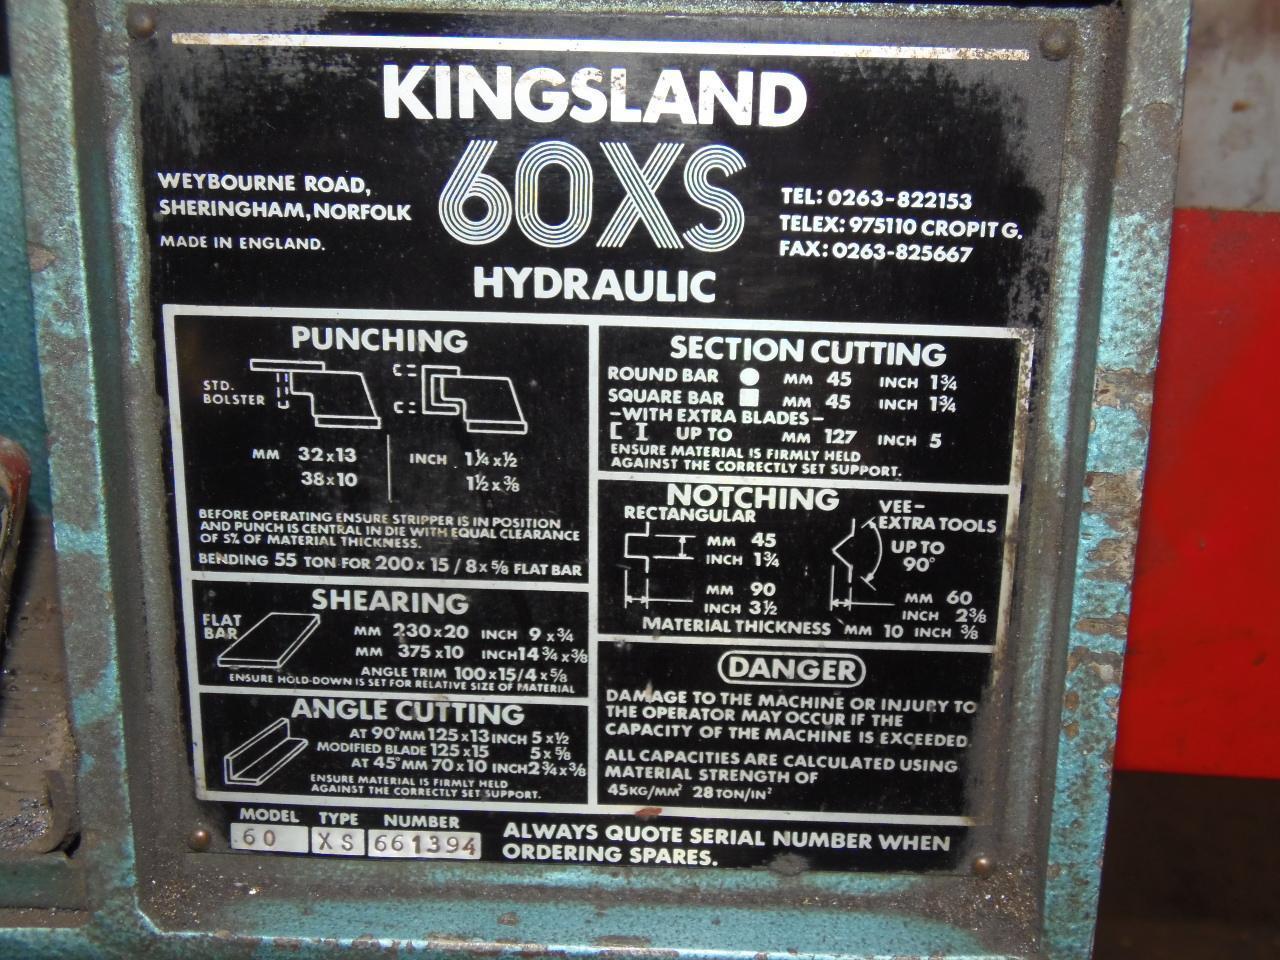 60 TON KINGSLAND HYDRAULIC IRONWORKER, MODEL 60XS